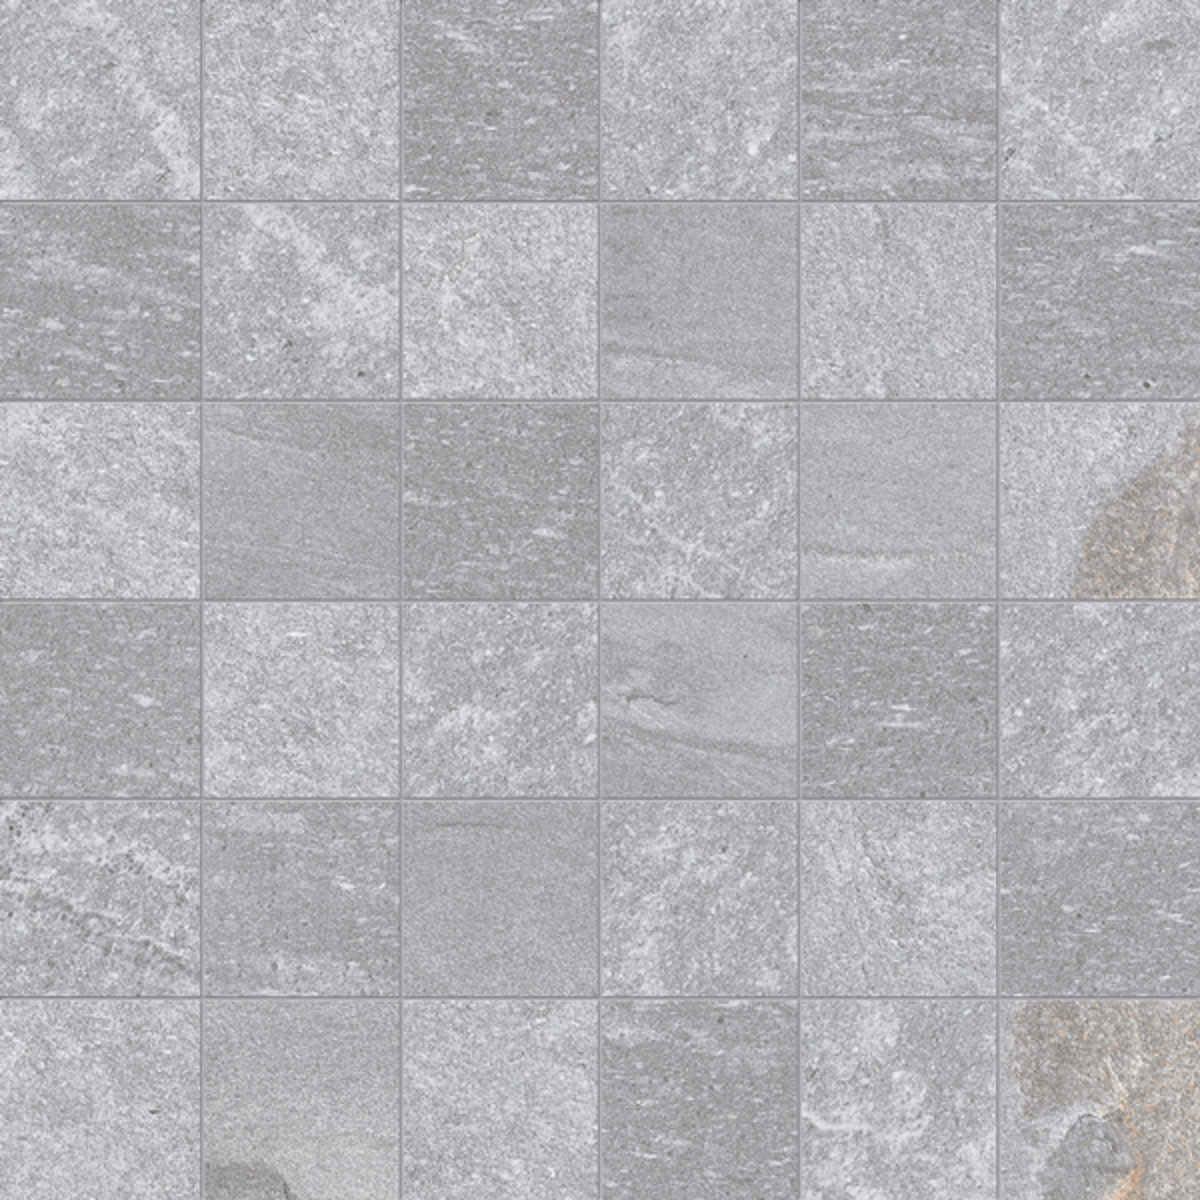 12x12 gray casa roma tracce 2x2 mosaic grey 0 97sqf p floor wall porcelain tile